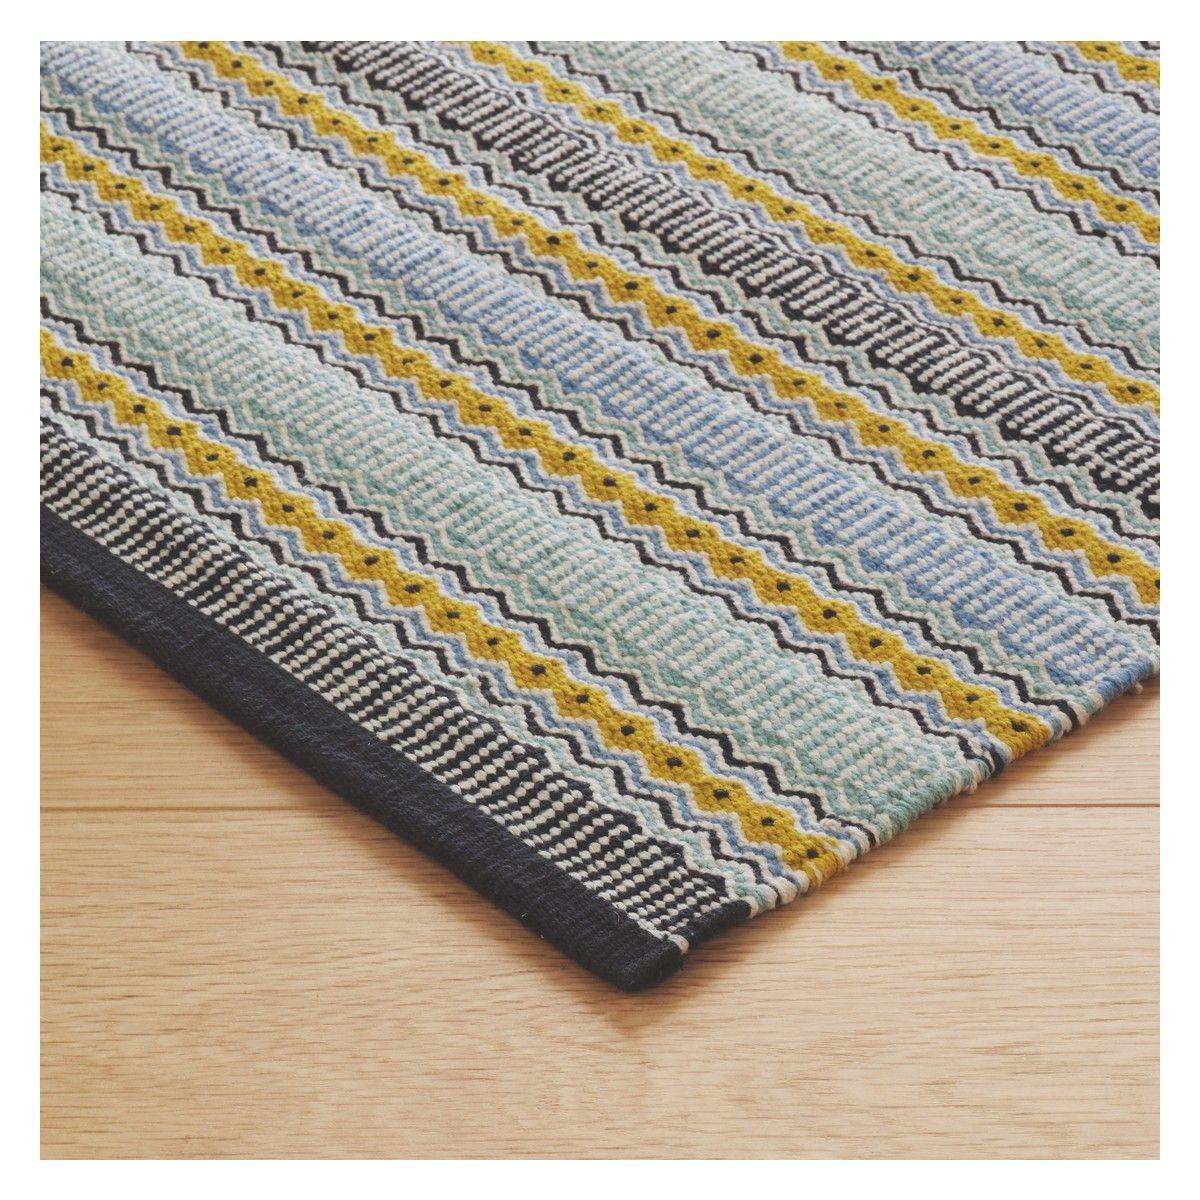 Agnes Small Blue Stripe Cotton Rug 120 X 180cm Flat Weave Rug Cotton Rug Blue Cotton Rug